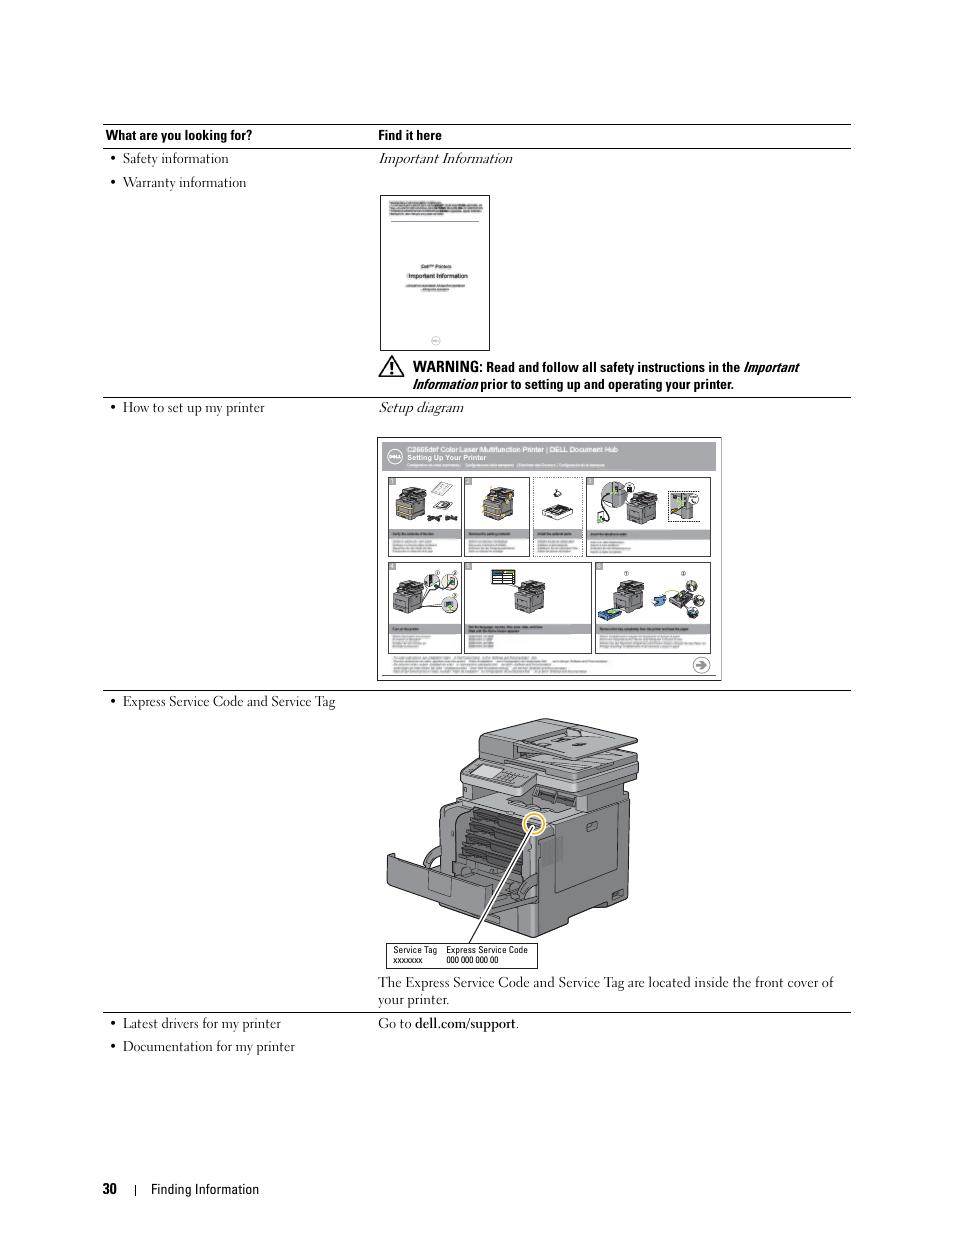 C2665dnf dell c2665dnf color laser multifunction printer user.